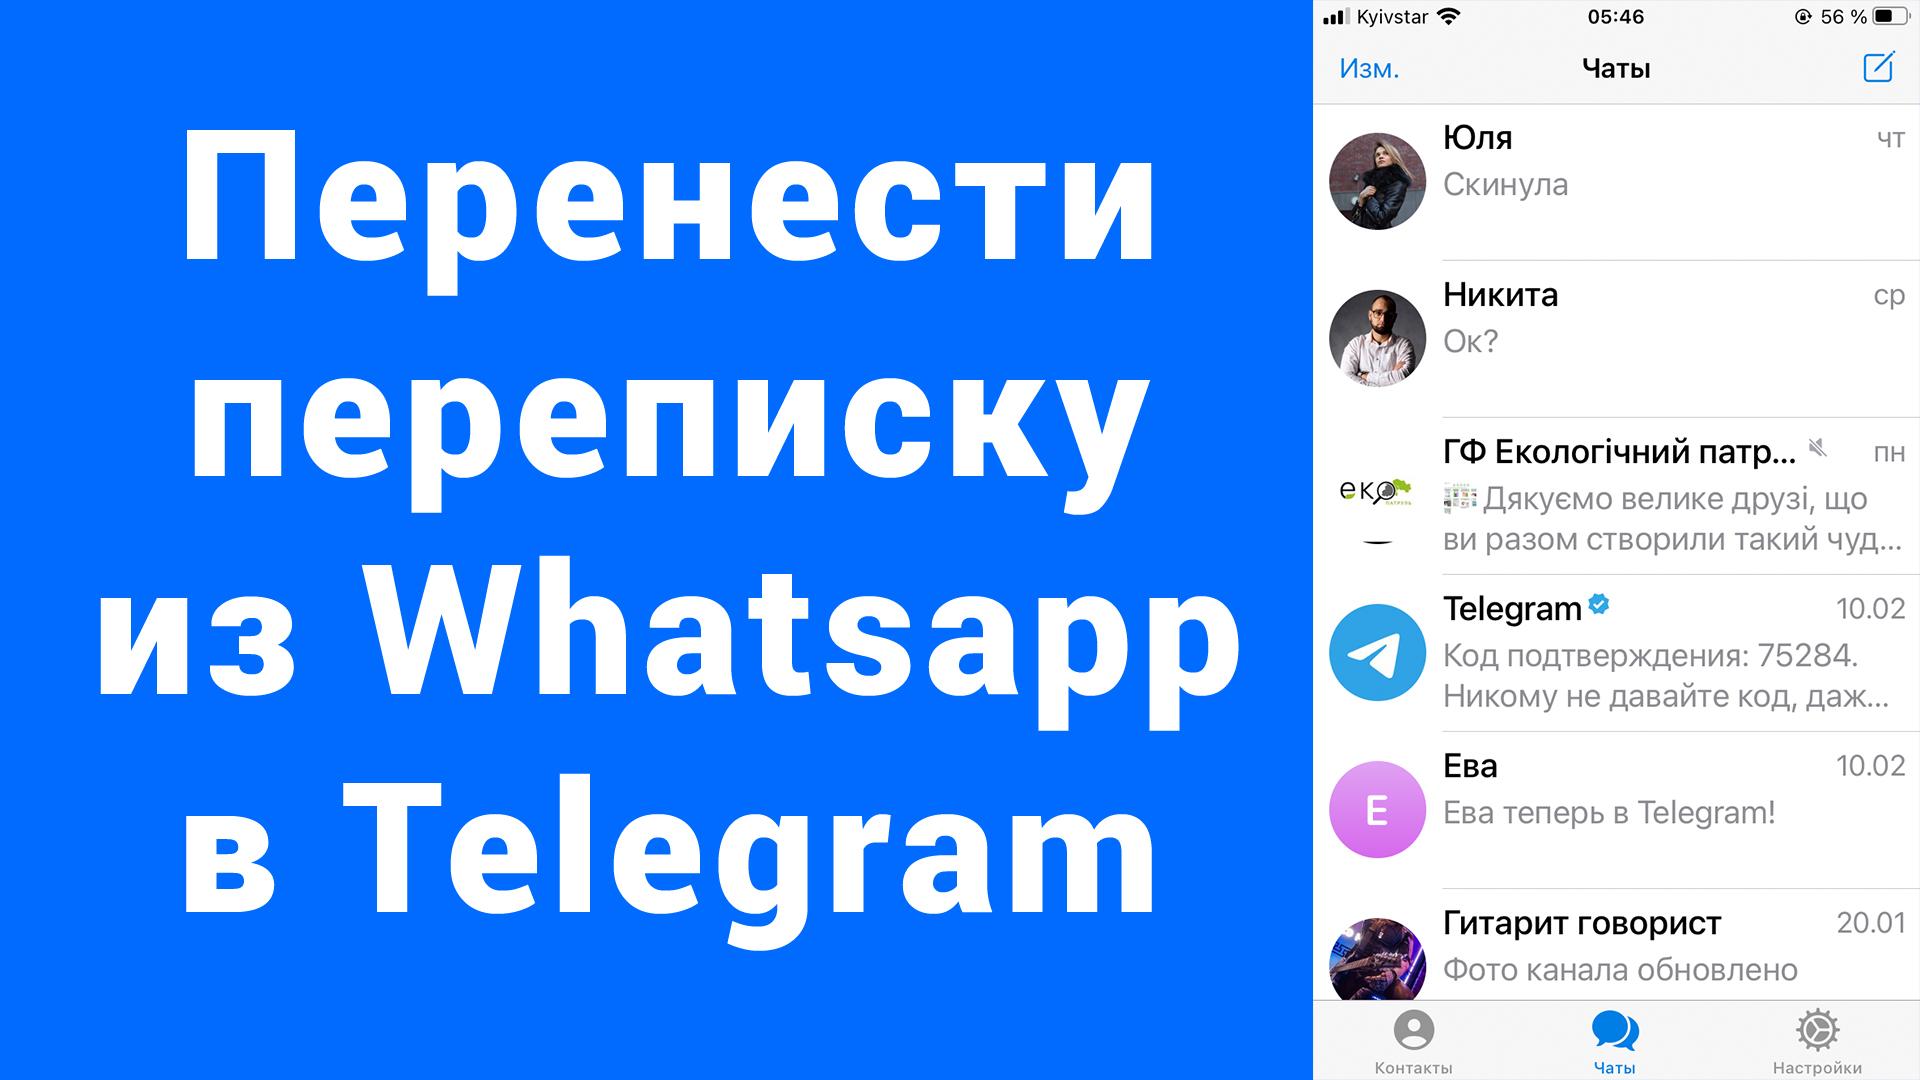 Как перенести переписку чат из WhatsApp в Telegram iPhone